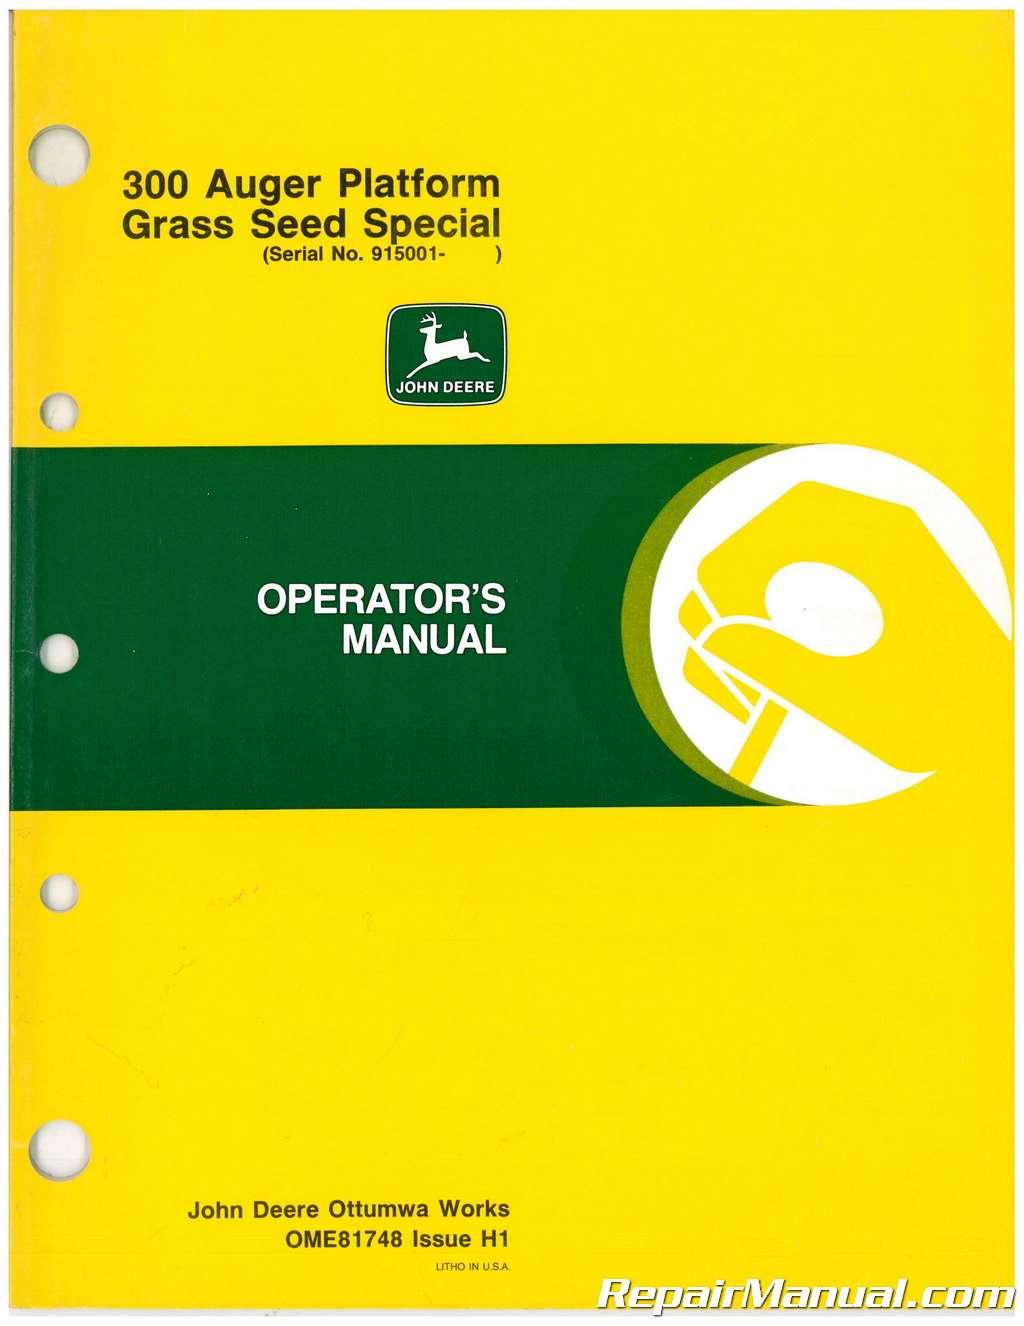 john deere operations center manual